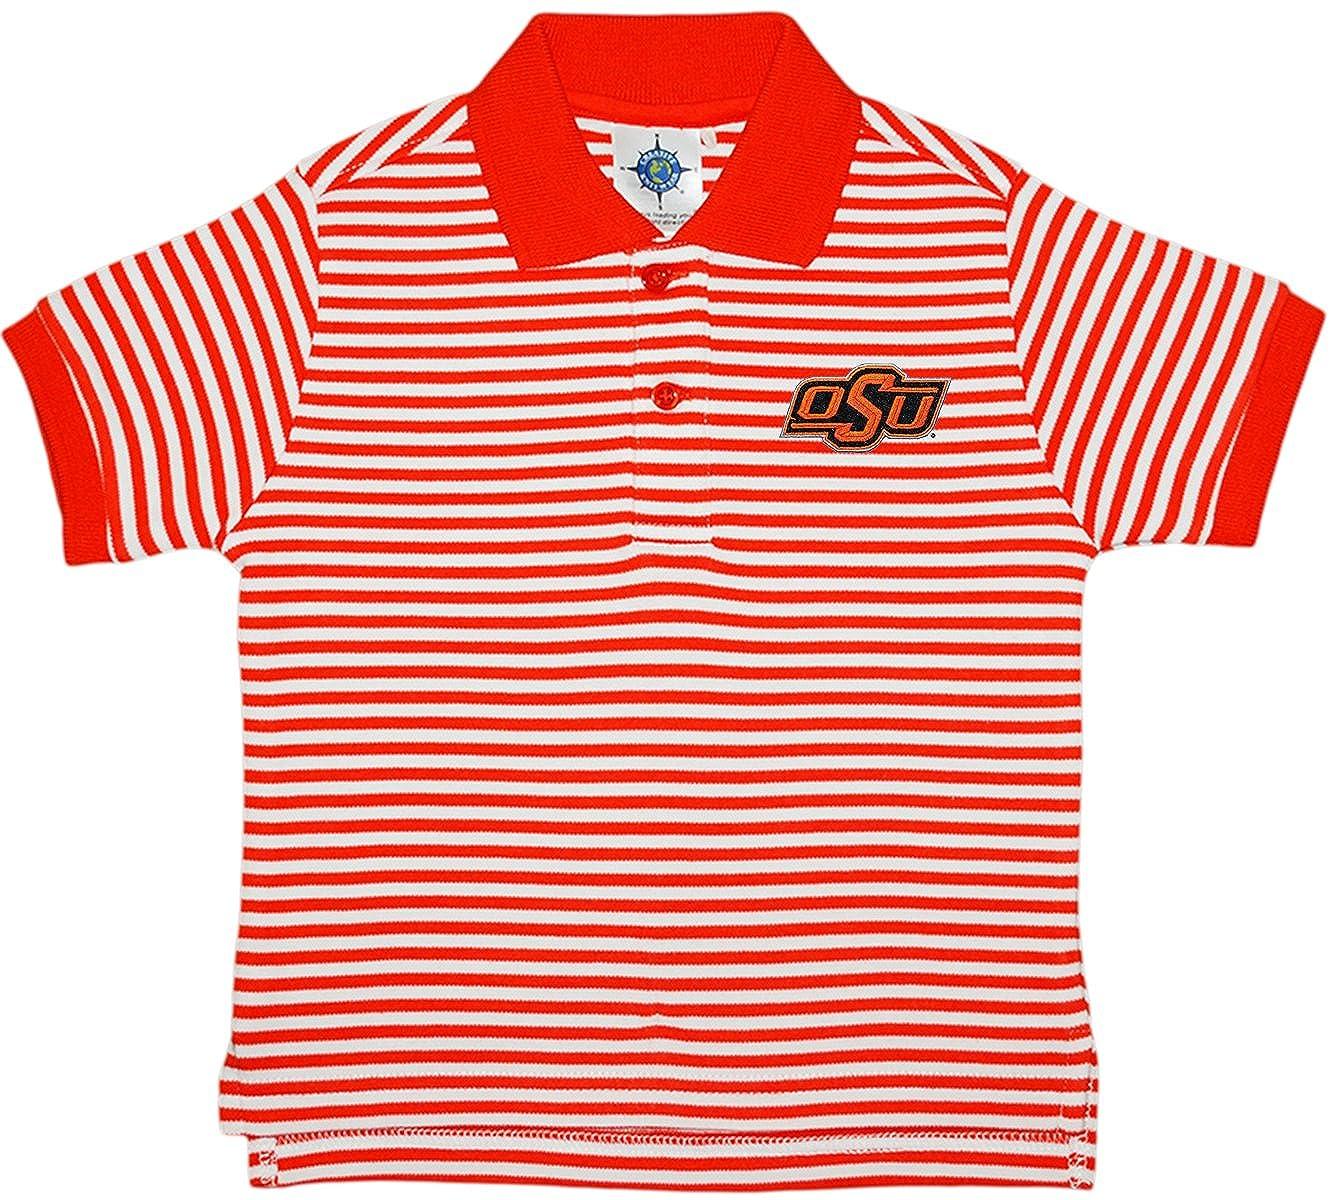 Creative Knitwear Oklahoma State University OSU Cowboys Striped Polo Shirt Orange/White 2T